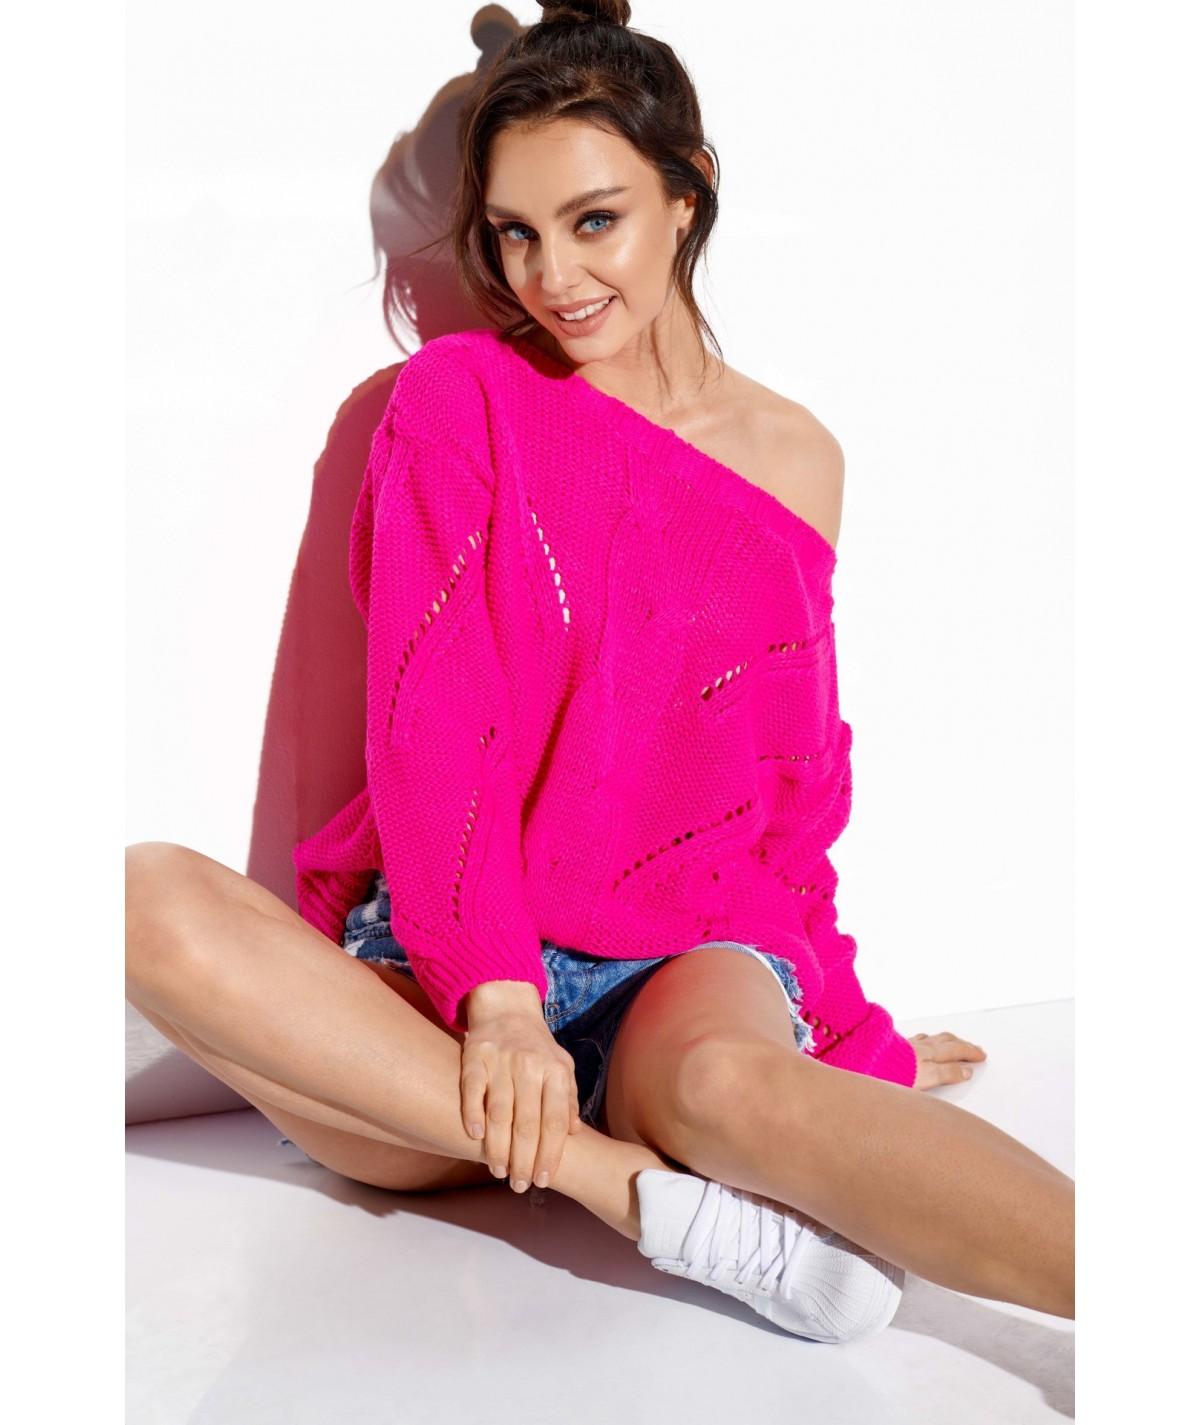 rózowy sweter damski lemoniade LS287